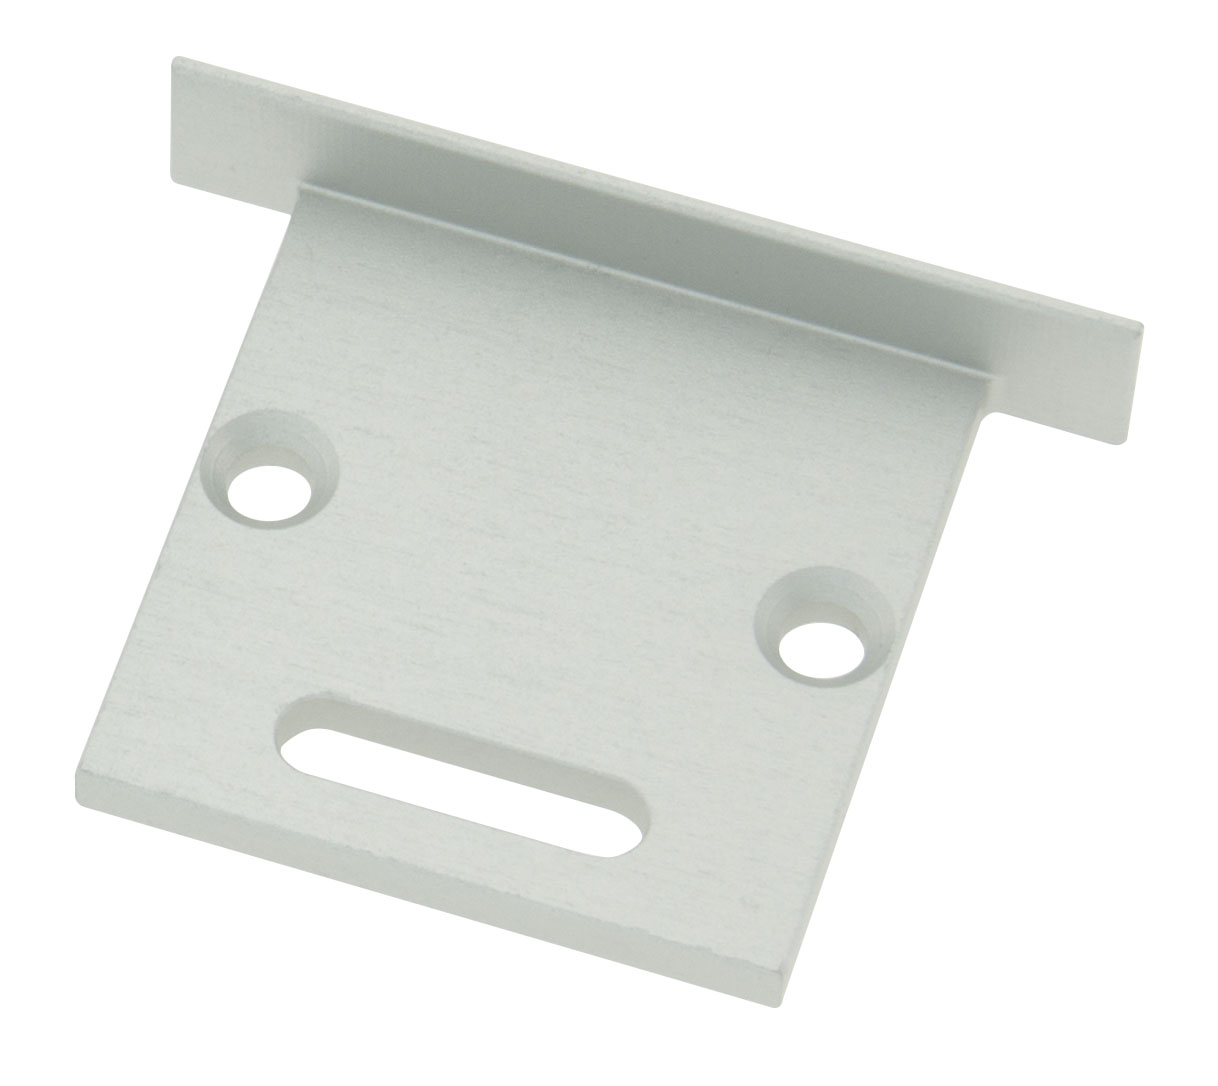 1 Stk Profil Endkappe TBI flach mit Langloch LIEK002301